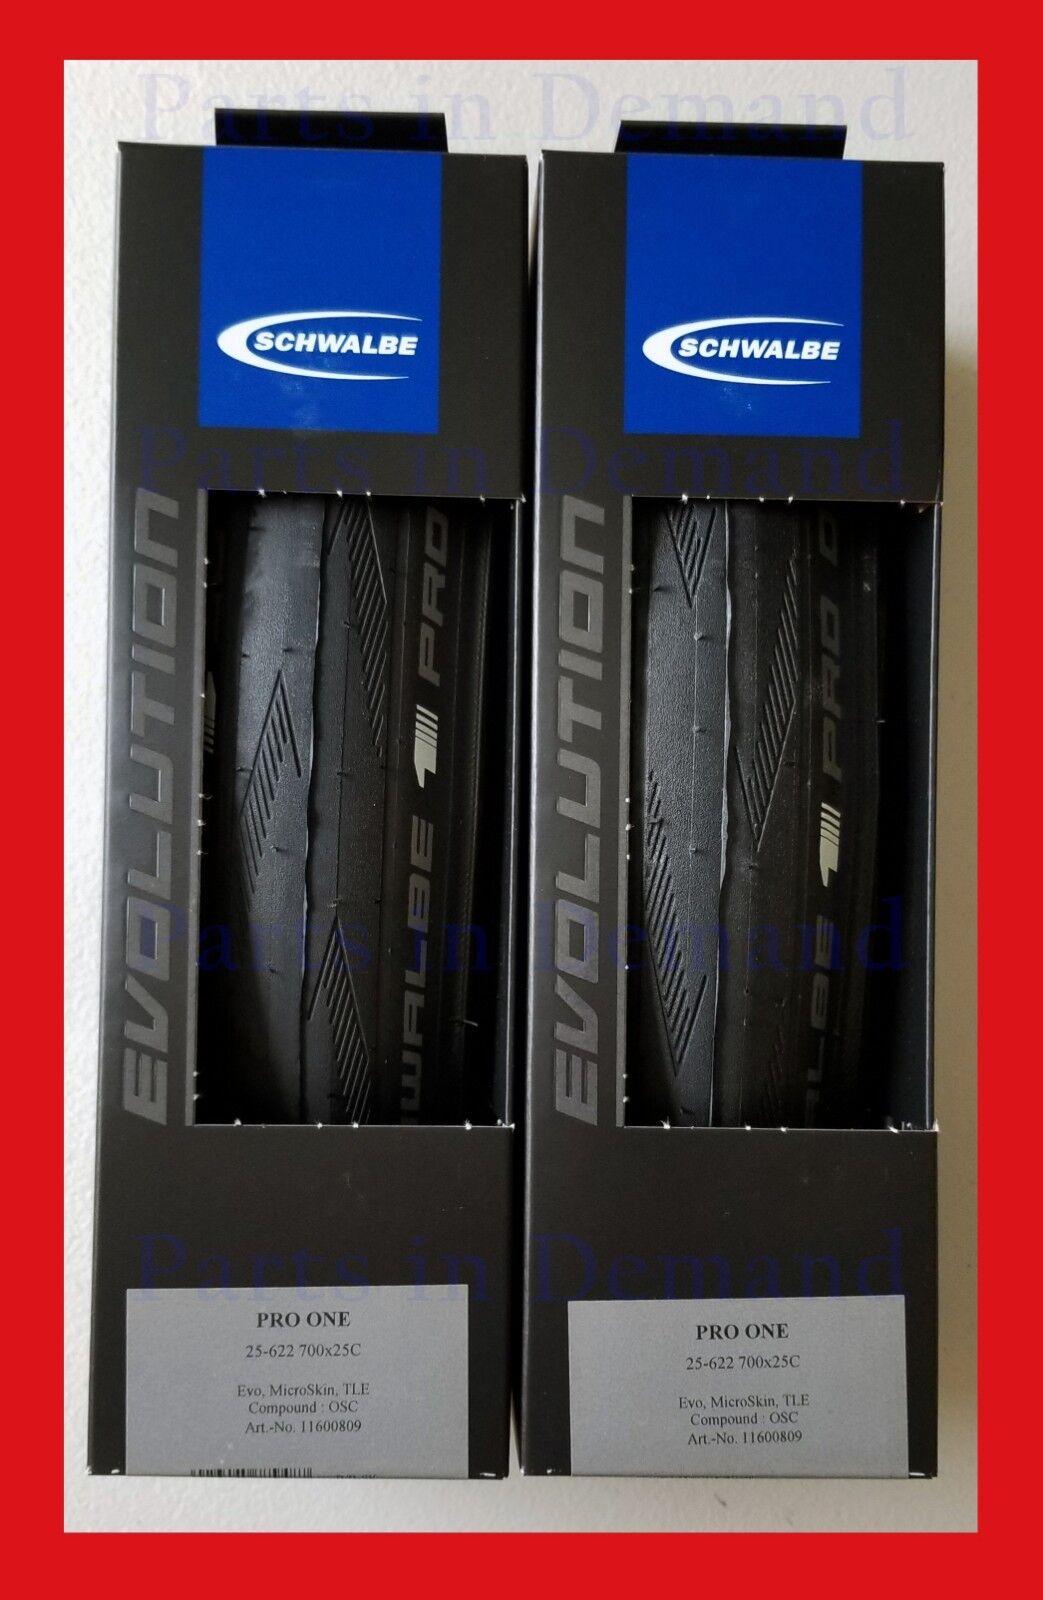 2019 Schwalbe PRO ONE Tubeless Clincher 700 x 25 PAIR 2 Road Bike Tire Microskin